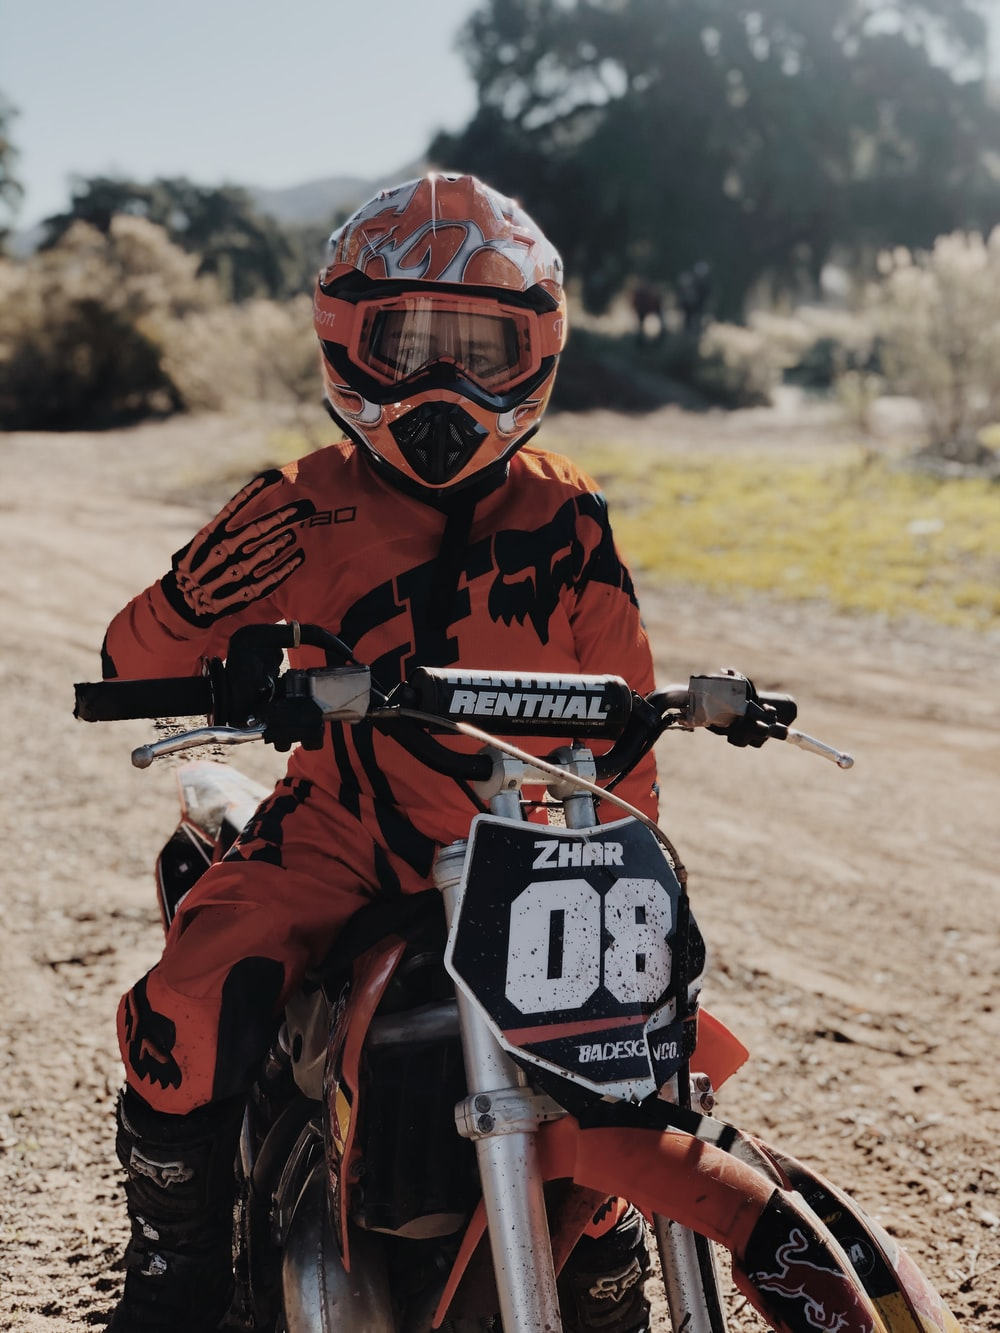 man in orange and black motocross suit riding motocross dirt bike